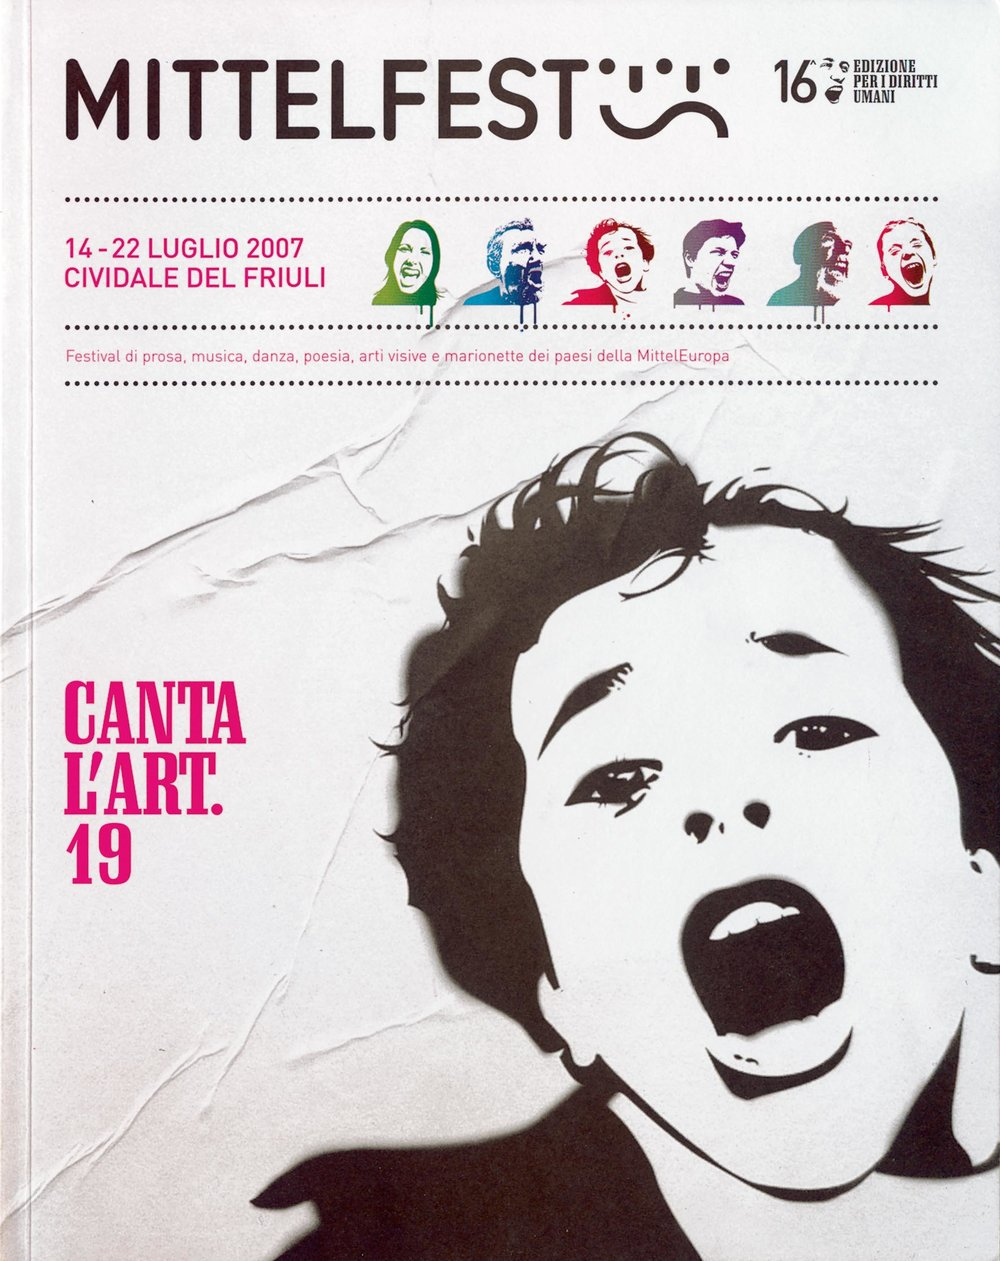 2007 Per i diritti umani